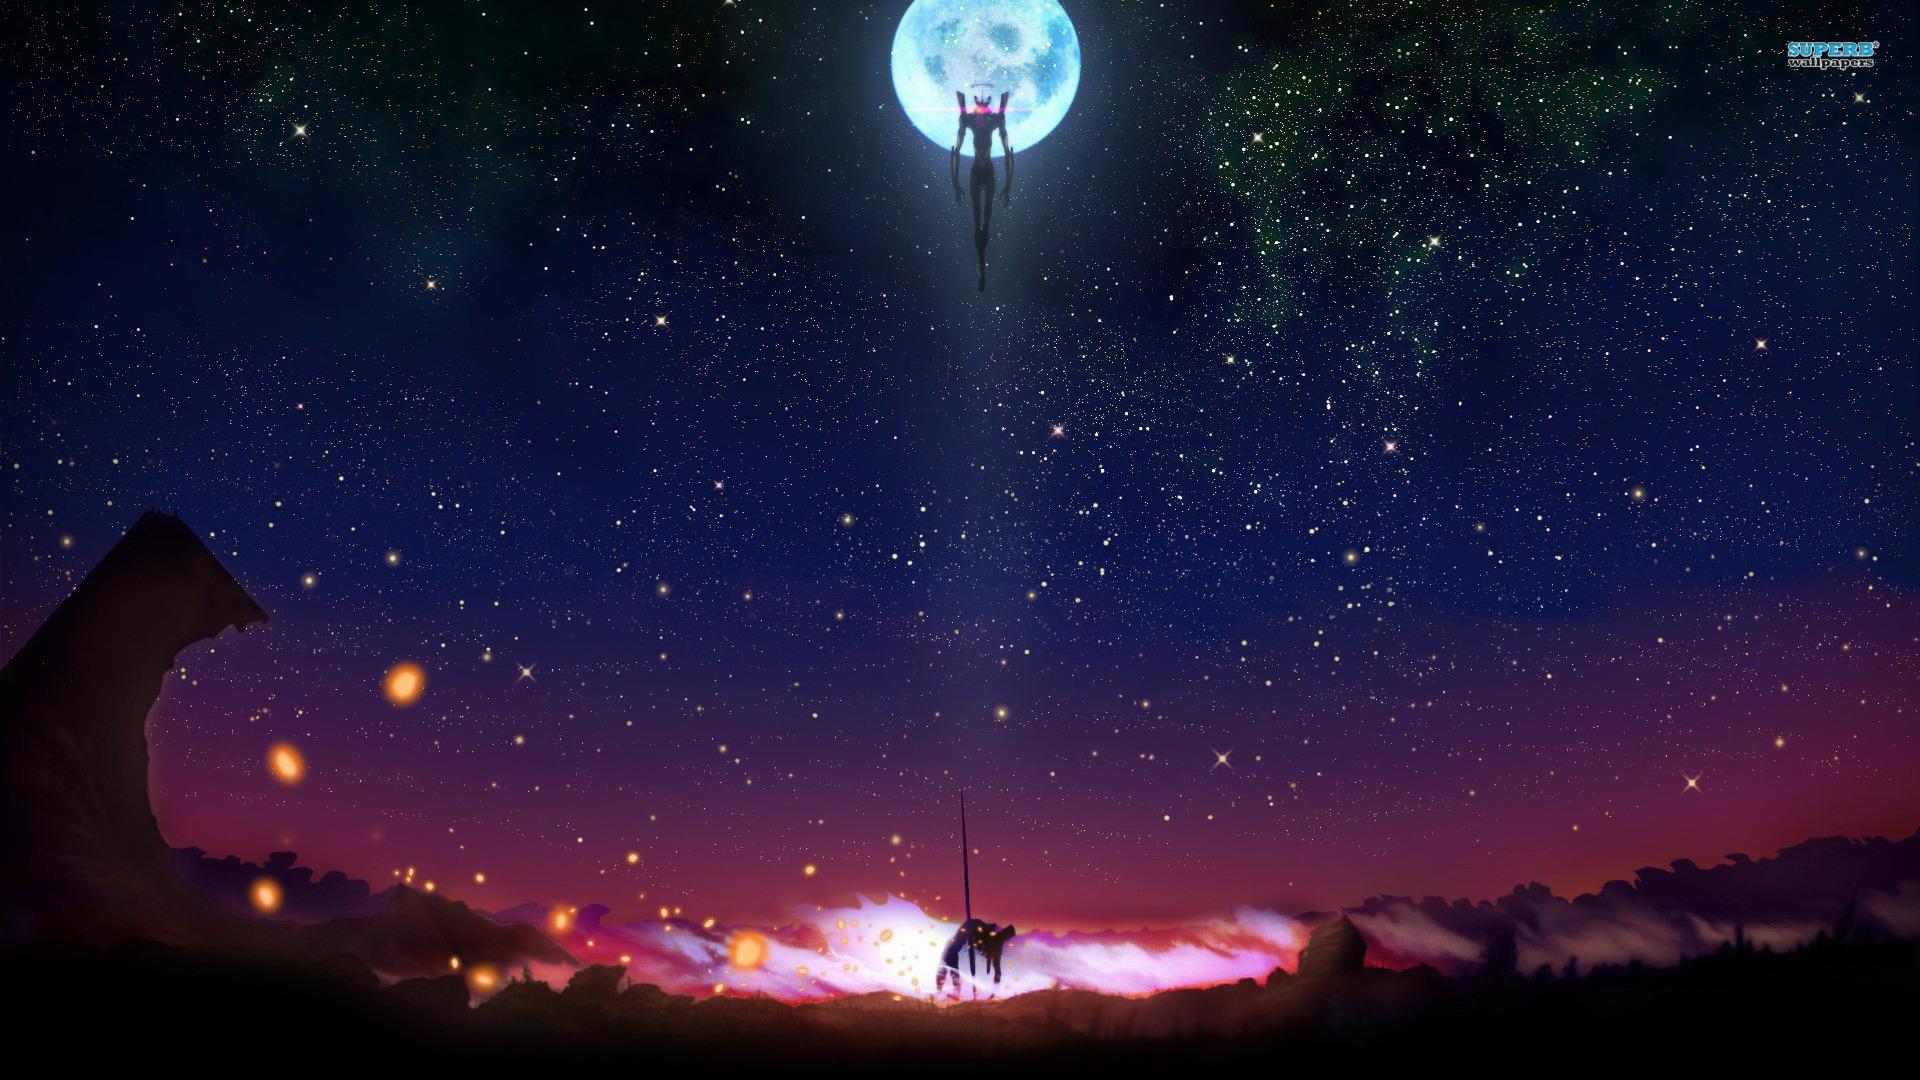 wallpaper anime evangelion genesis wallpapers 1920x1080 1920x1080